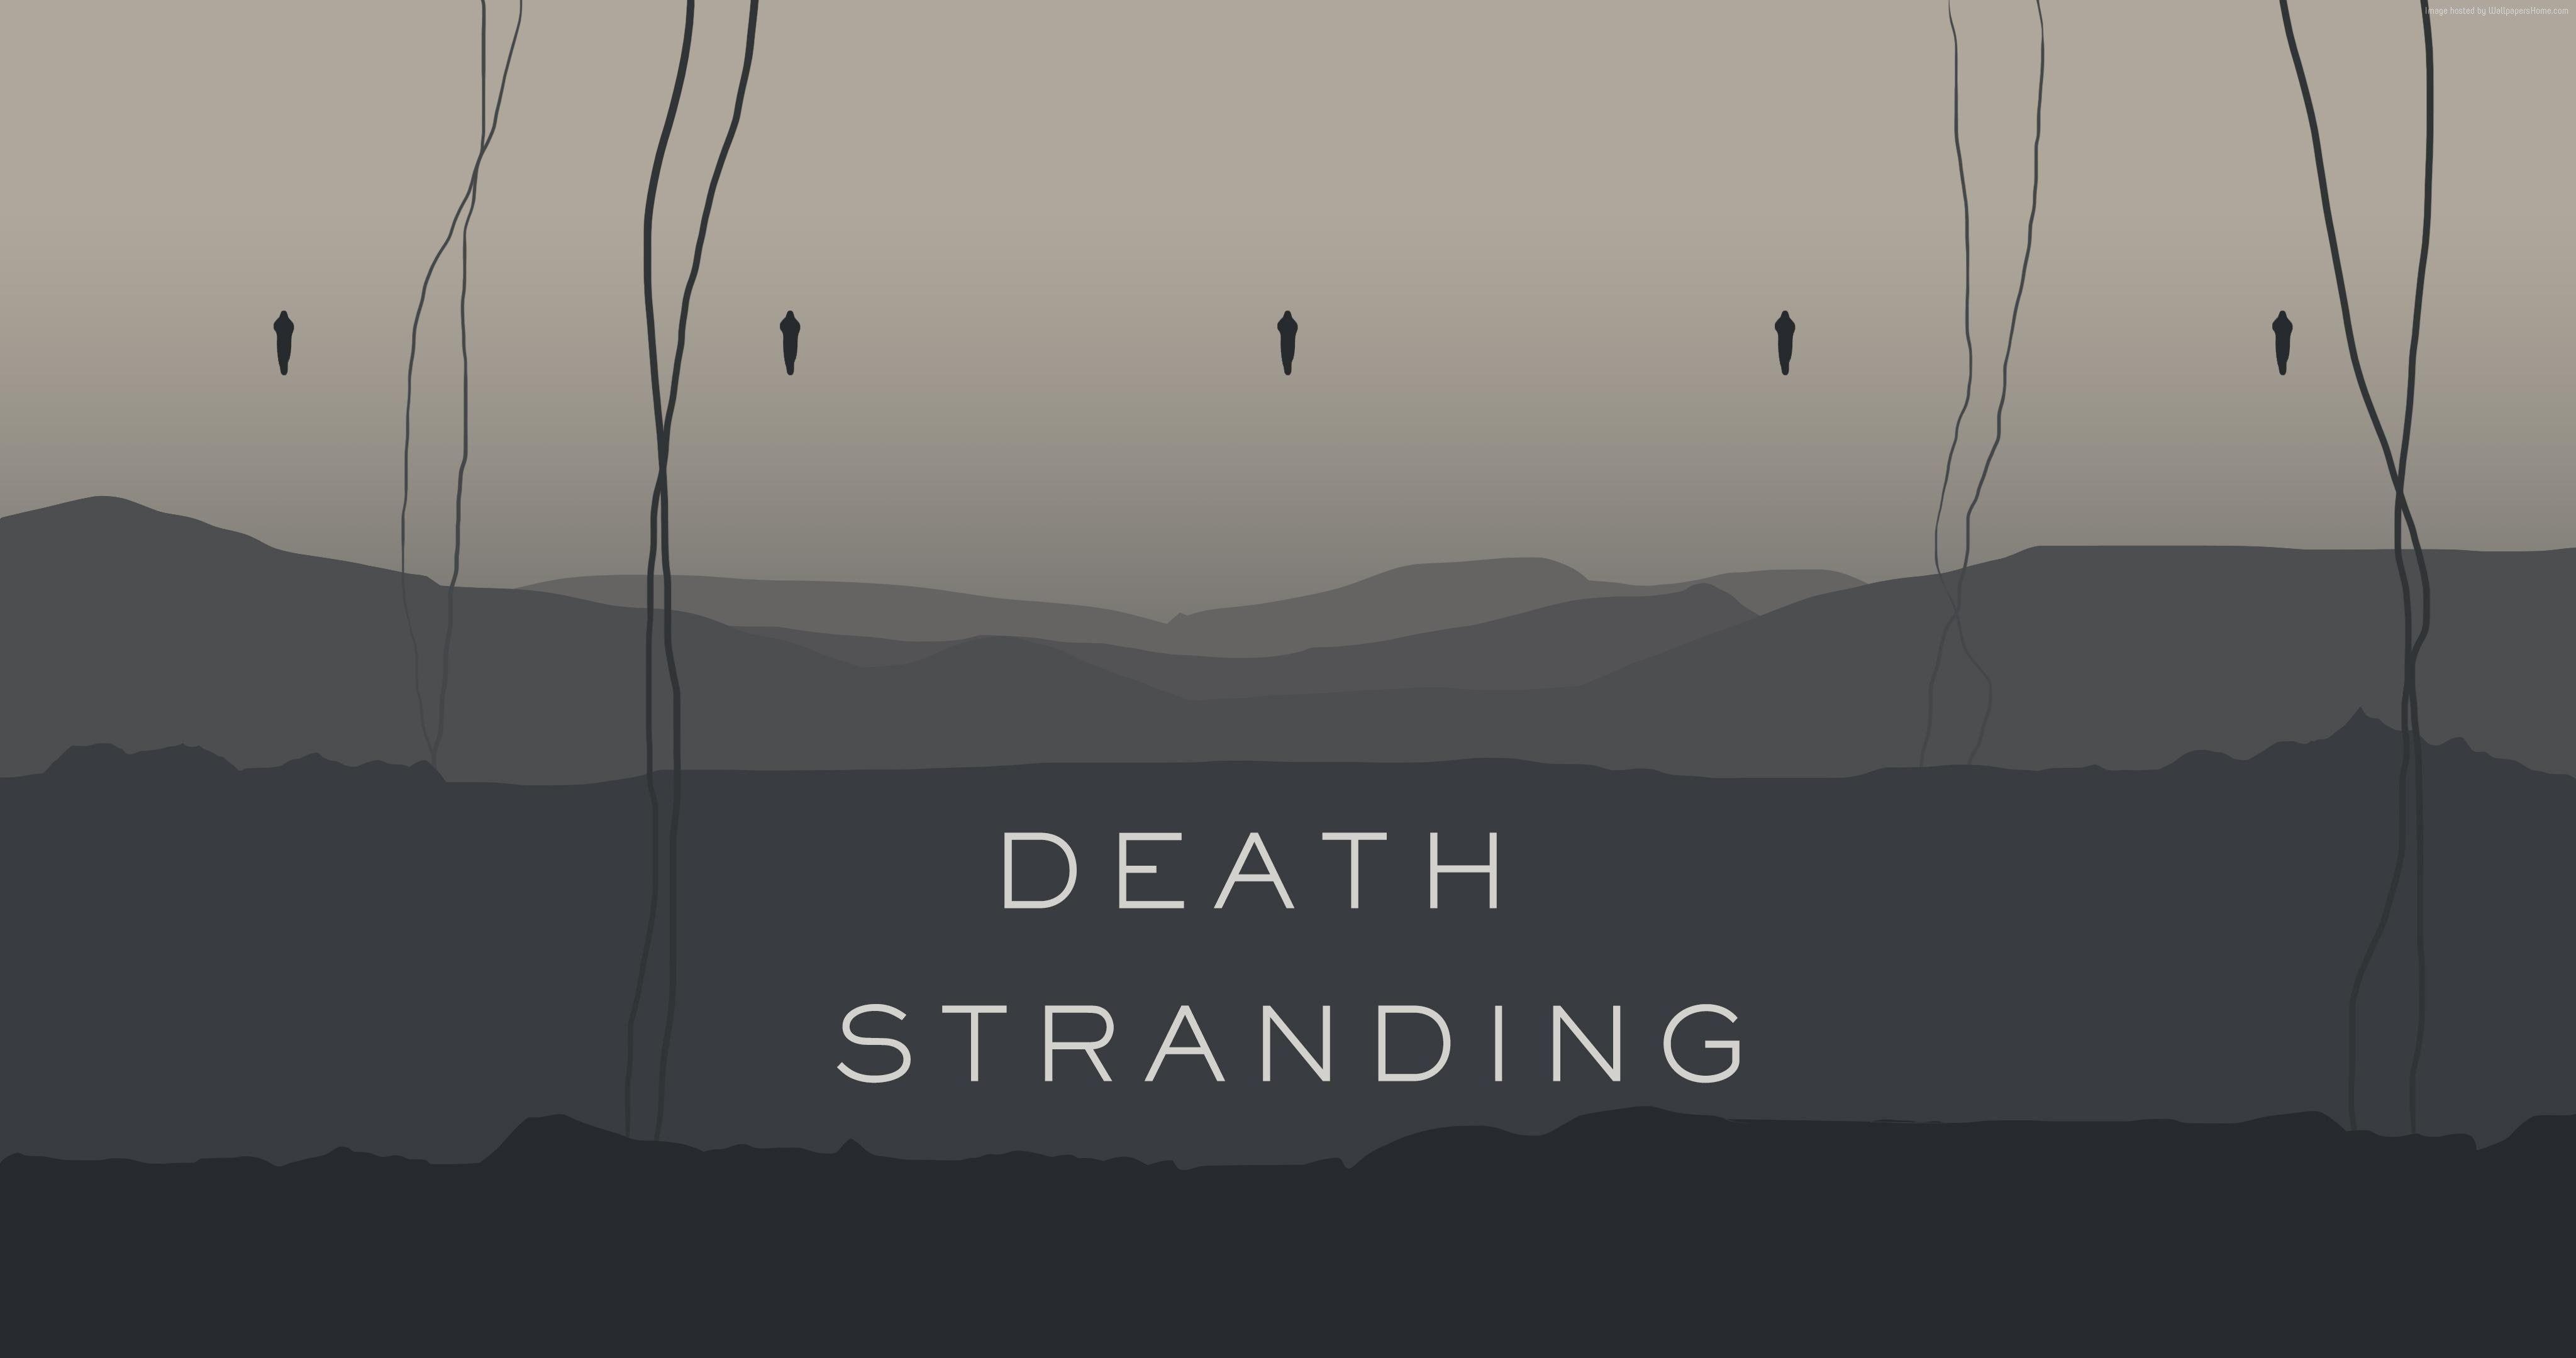 Death Stranding Hideo Kojima Video Games 4k Wallpaper Hdwallpaper Desktop Hd Wallpaper Wallpaper Latest Hd Wallpapers